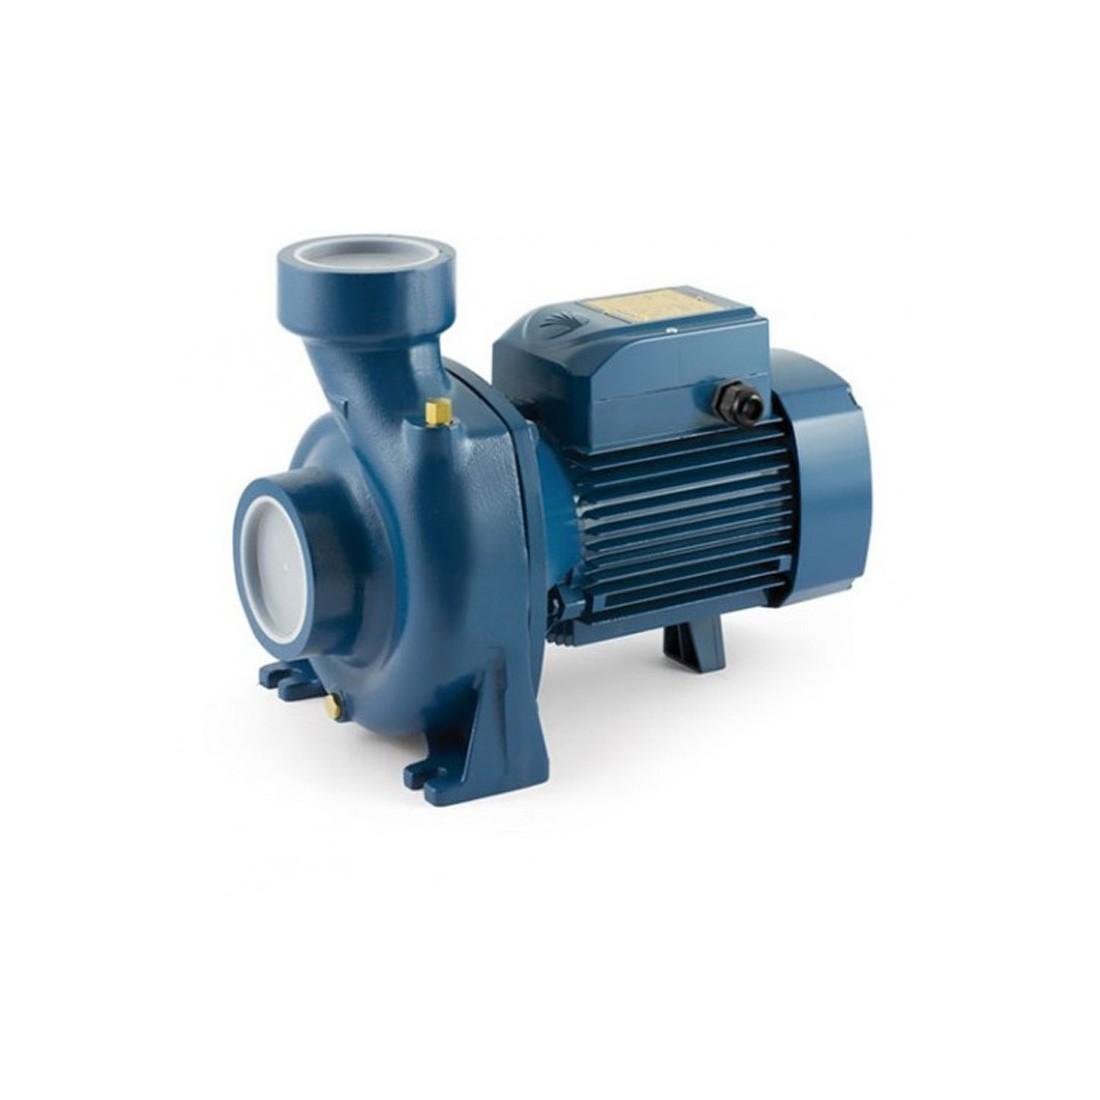 Pompa de suprafata centrifugala Pedrollo HFm 5AM monofazata